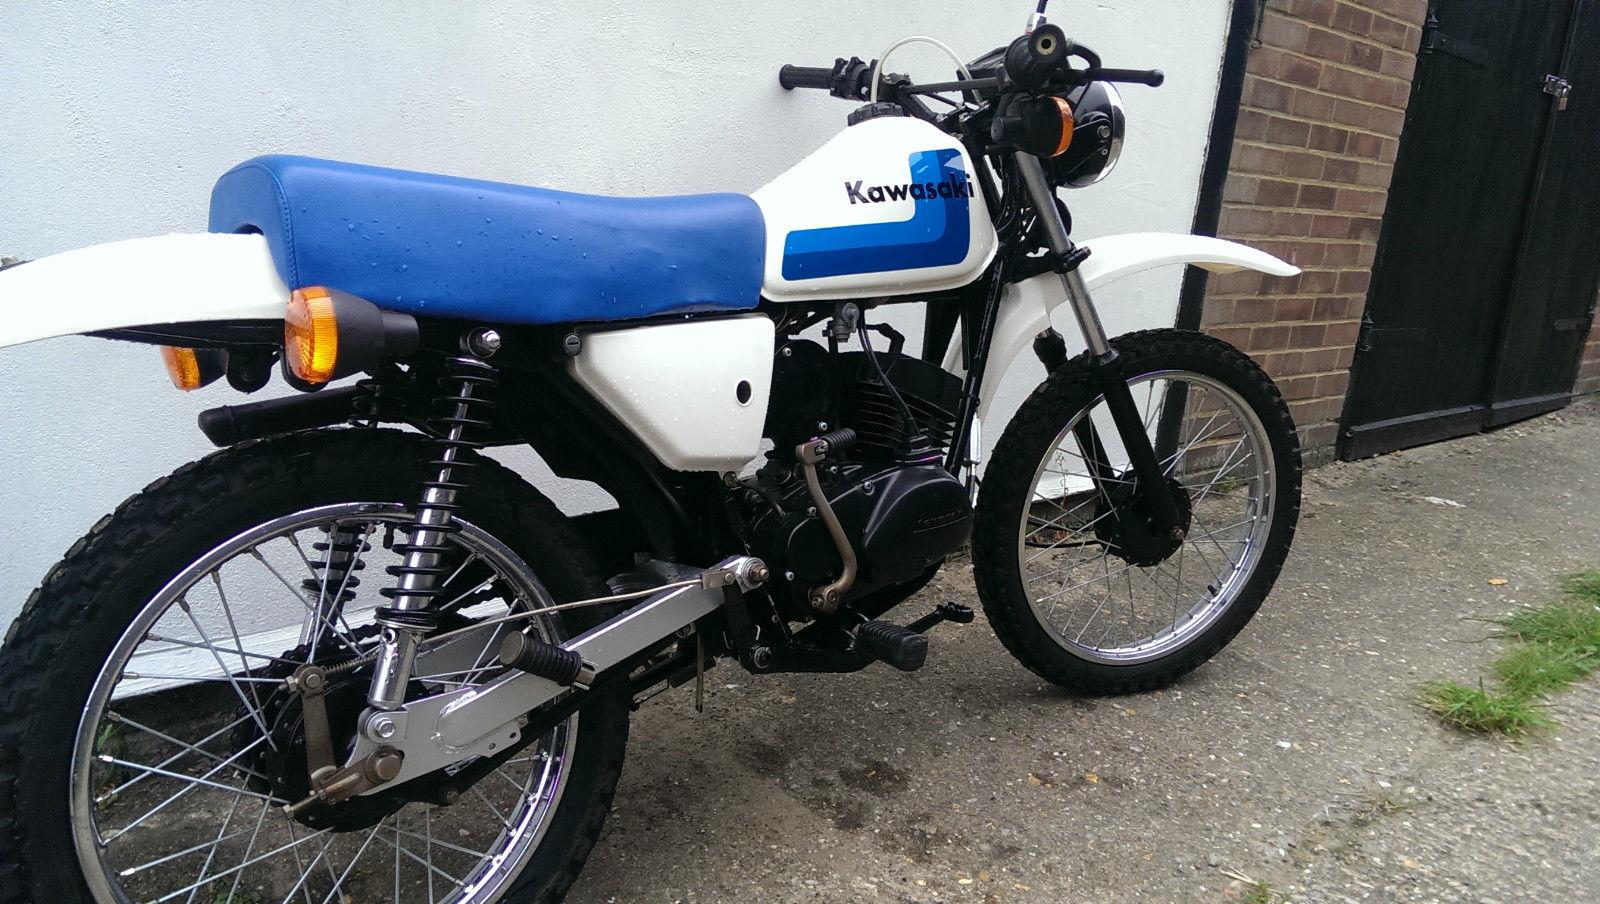 Kawasaki KE100 1989 Model - Recently Fully Restored - Very Good Condition